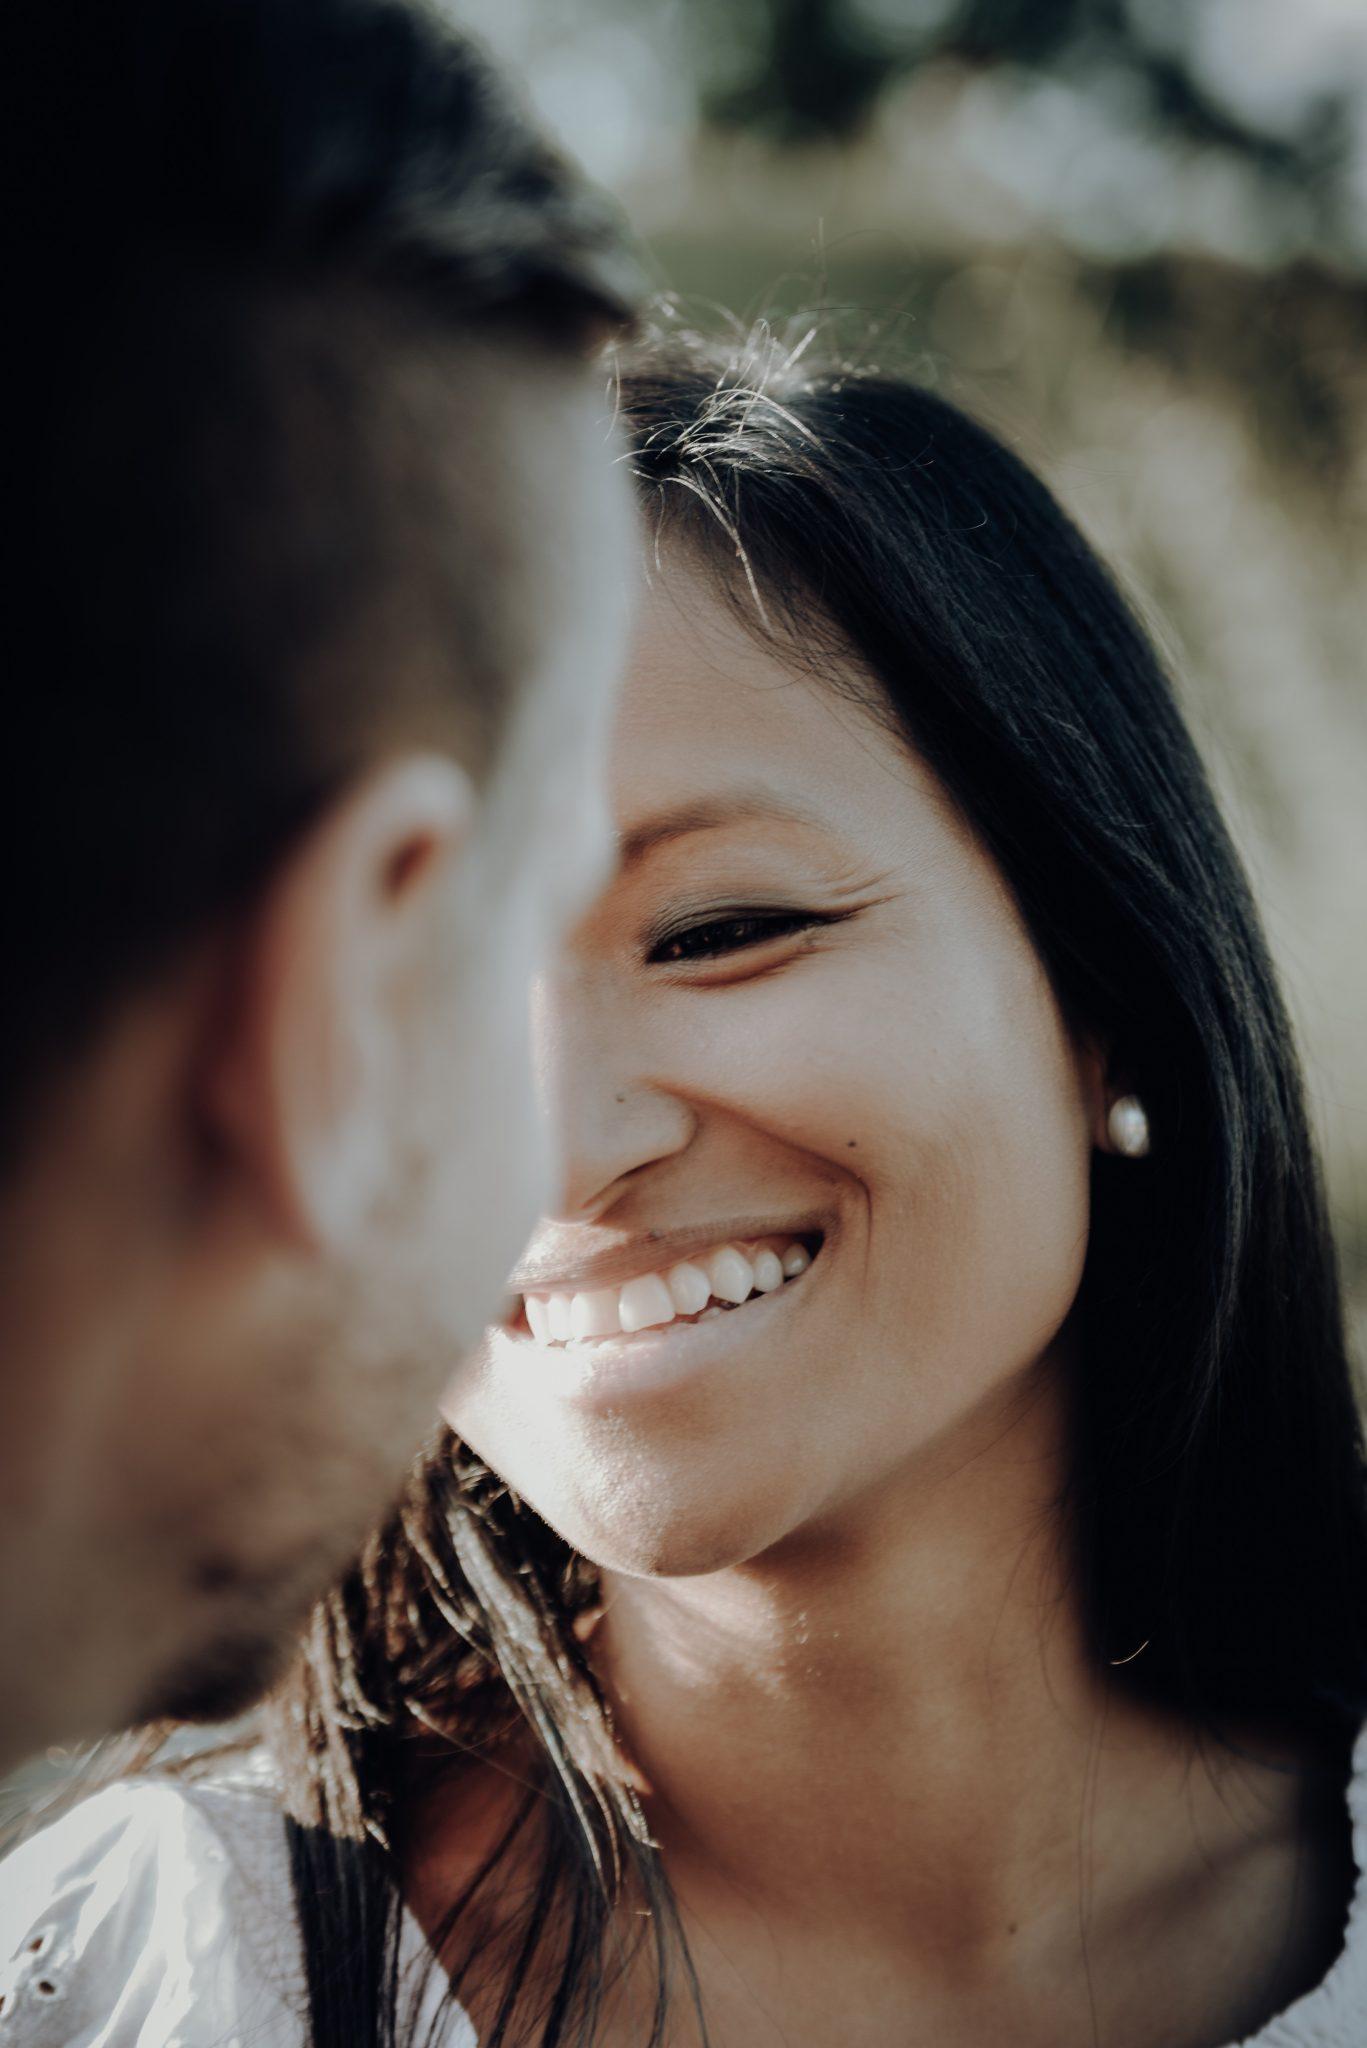 Frau lächelt Mann an